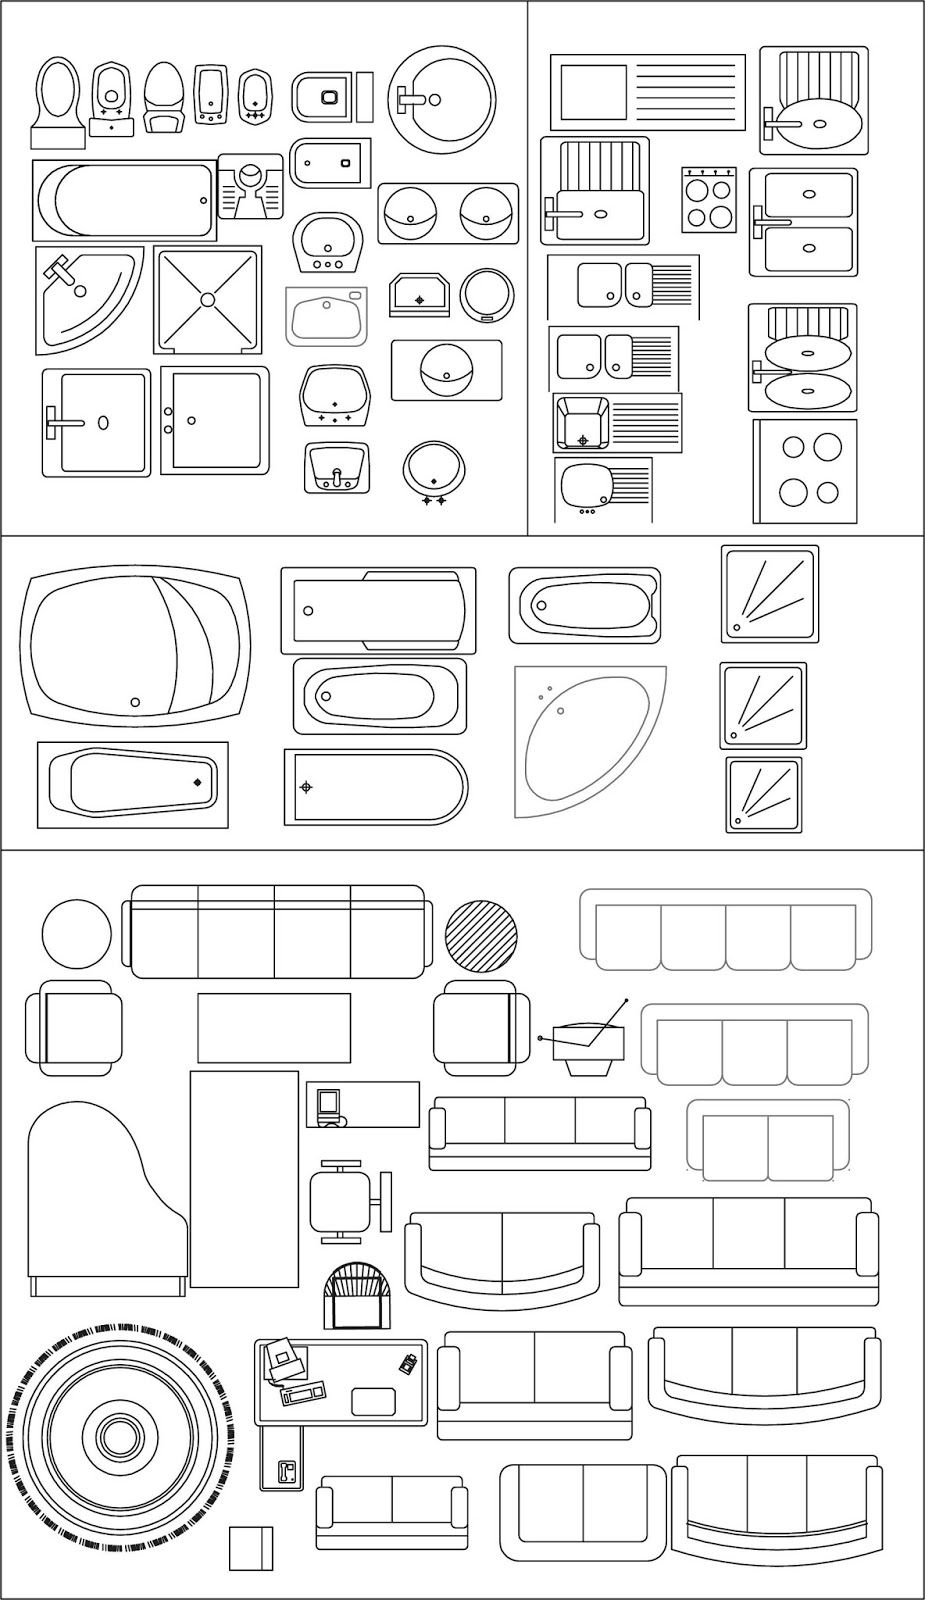 Ideark cali softwares aplicados a dise o ingenieria y for Medidas de muebles para planos arquitectonicos